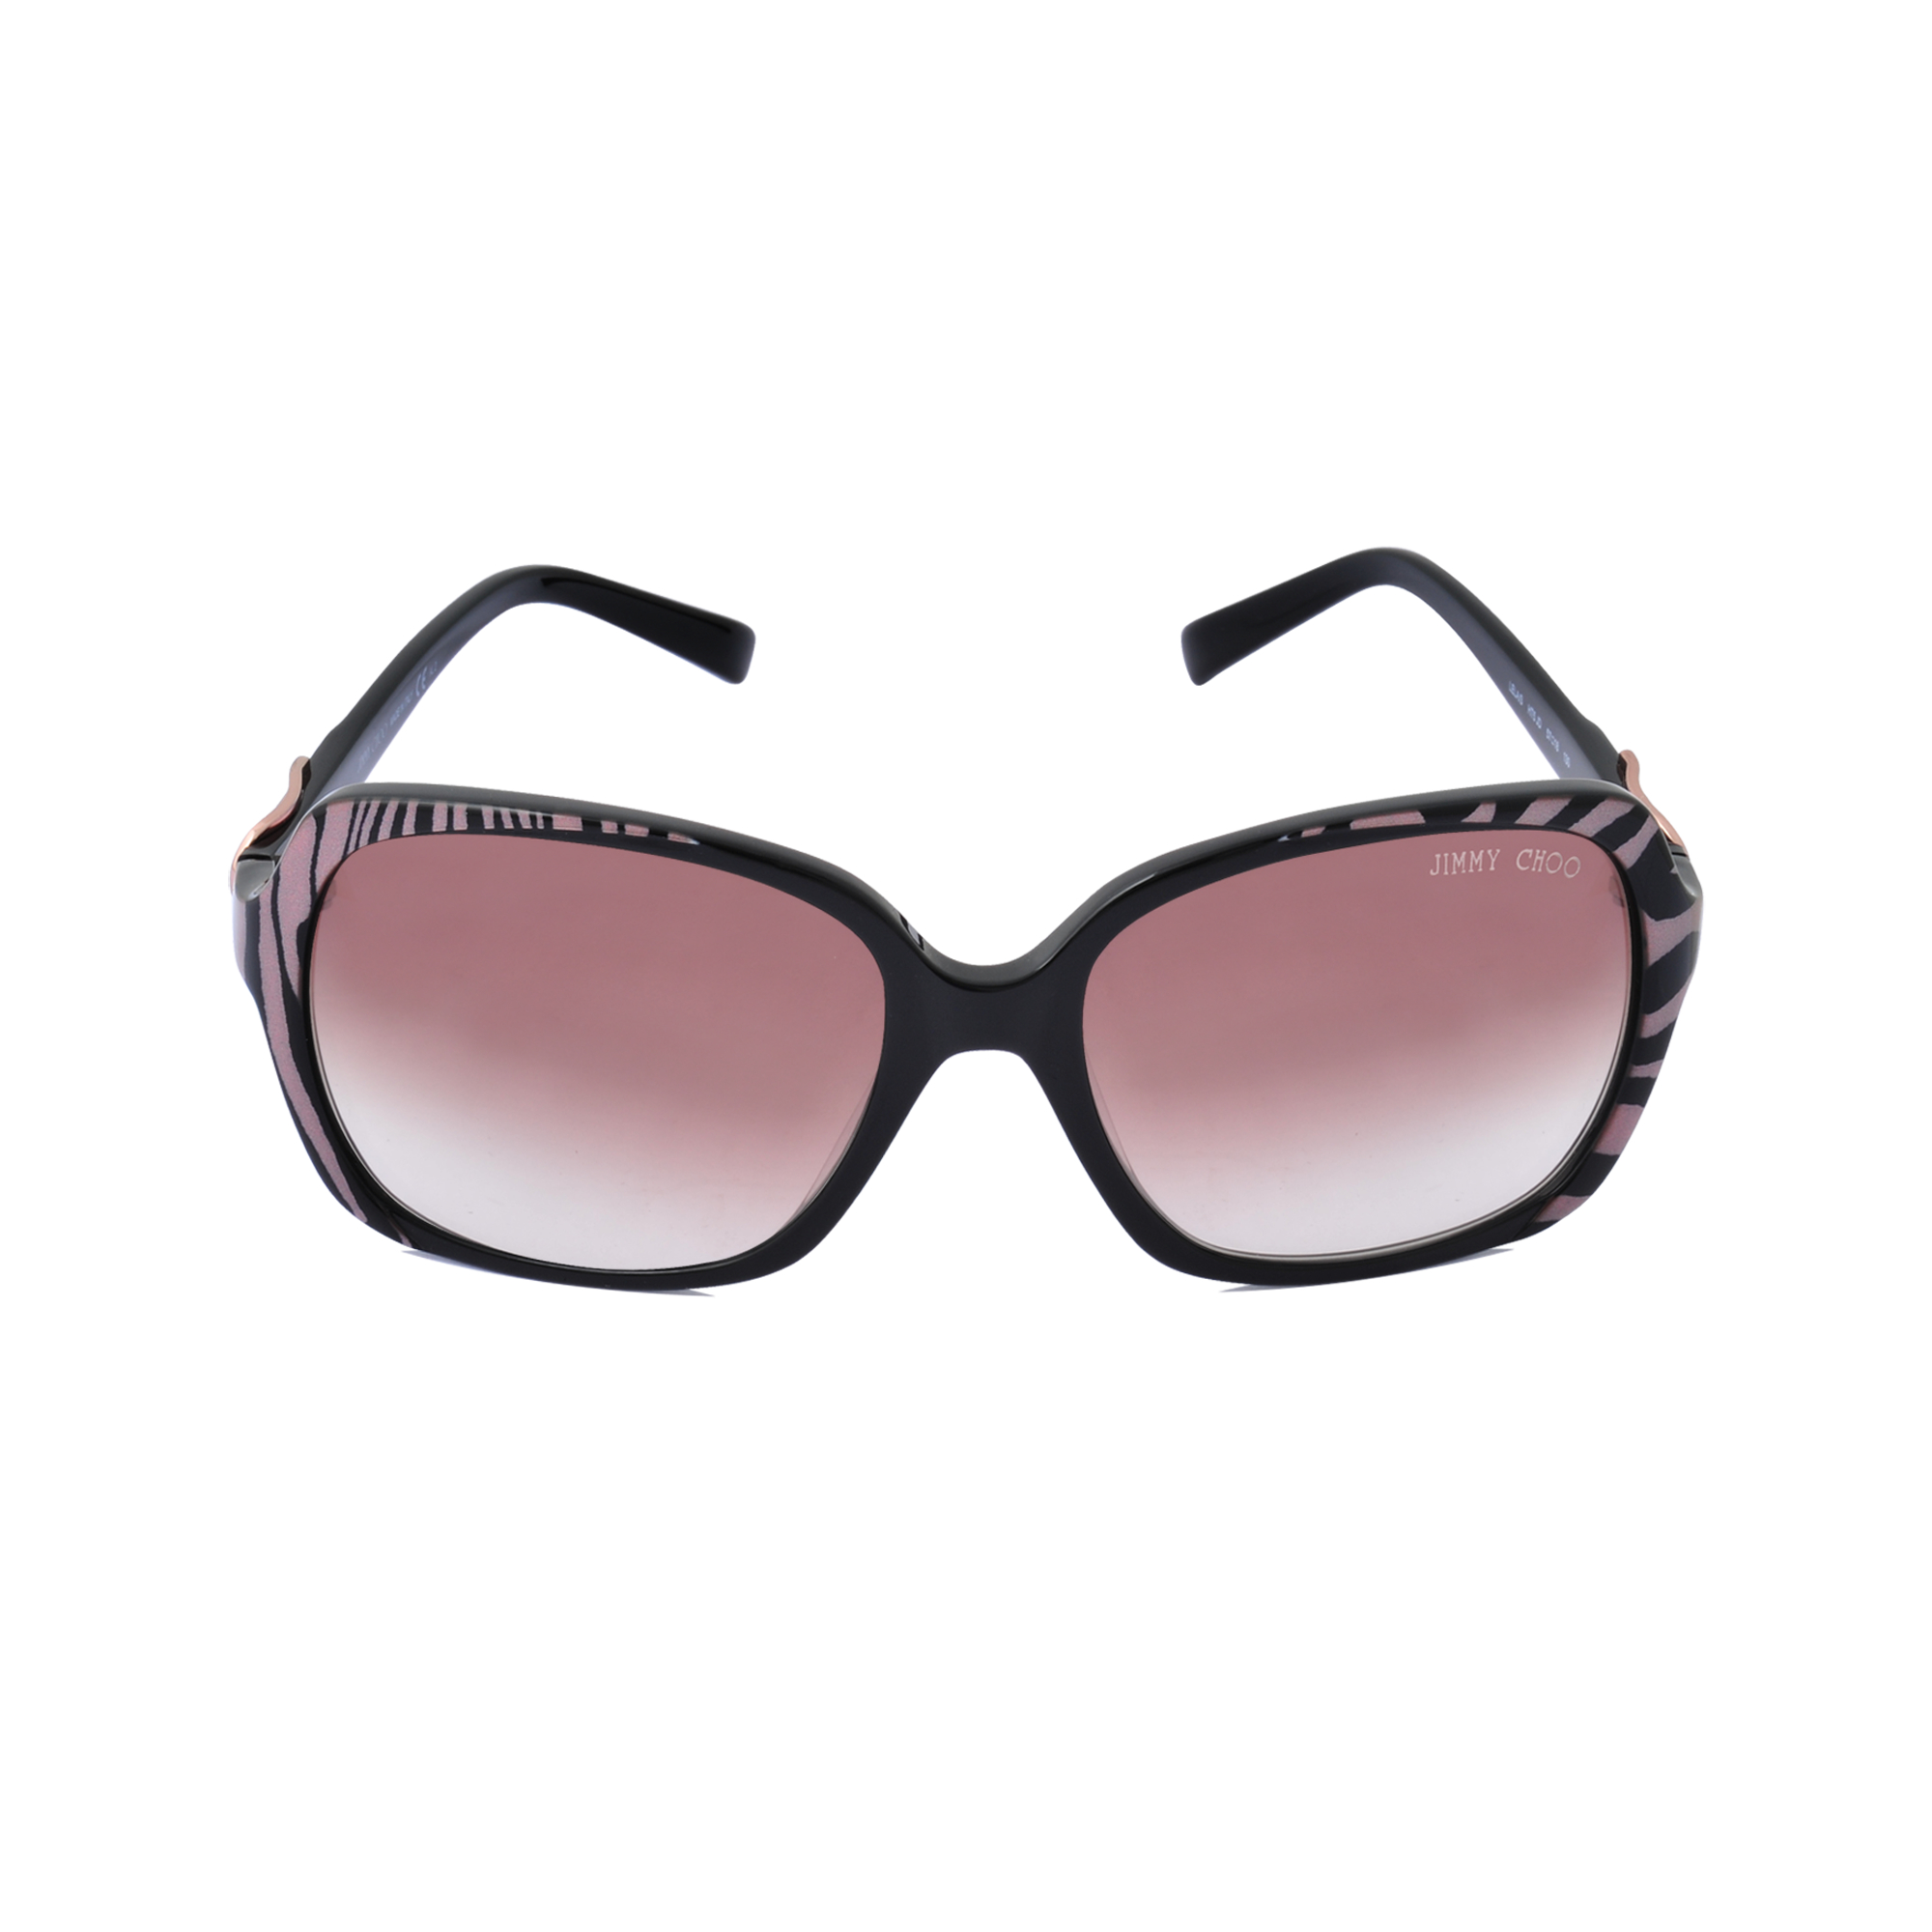 jimmy choo eyewear collection 2015 de miu miu Simply ...